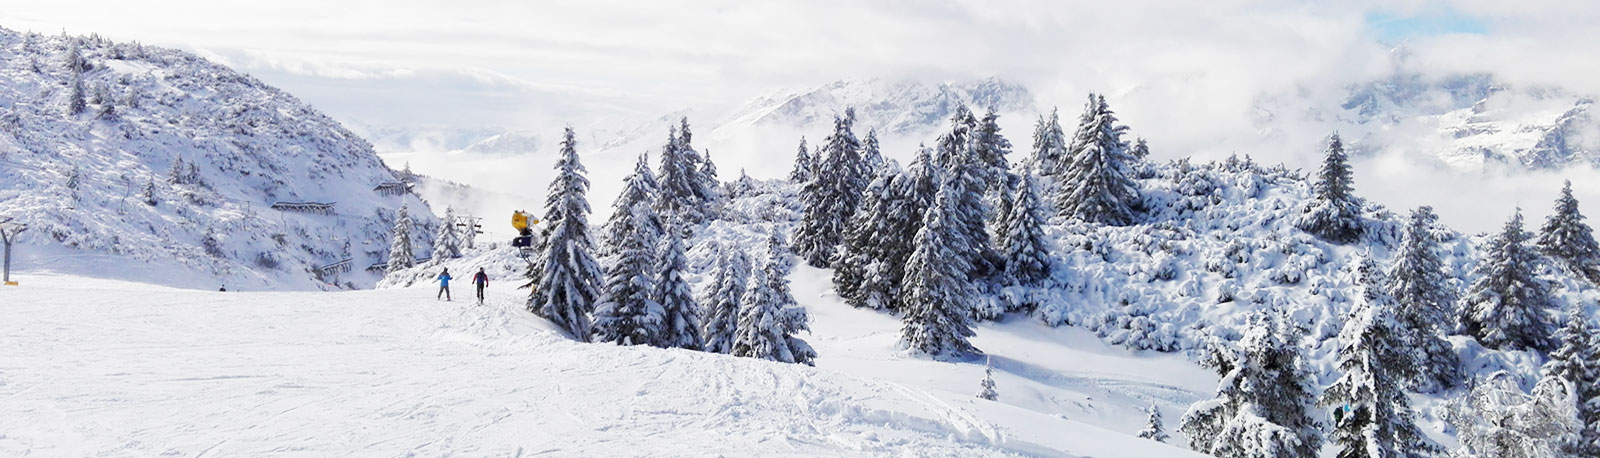 Paganella School Ski Trips